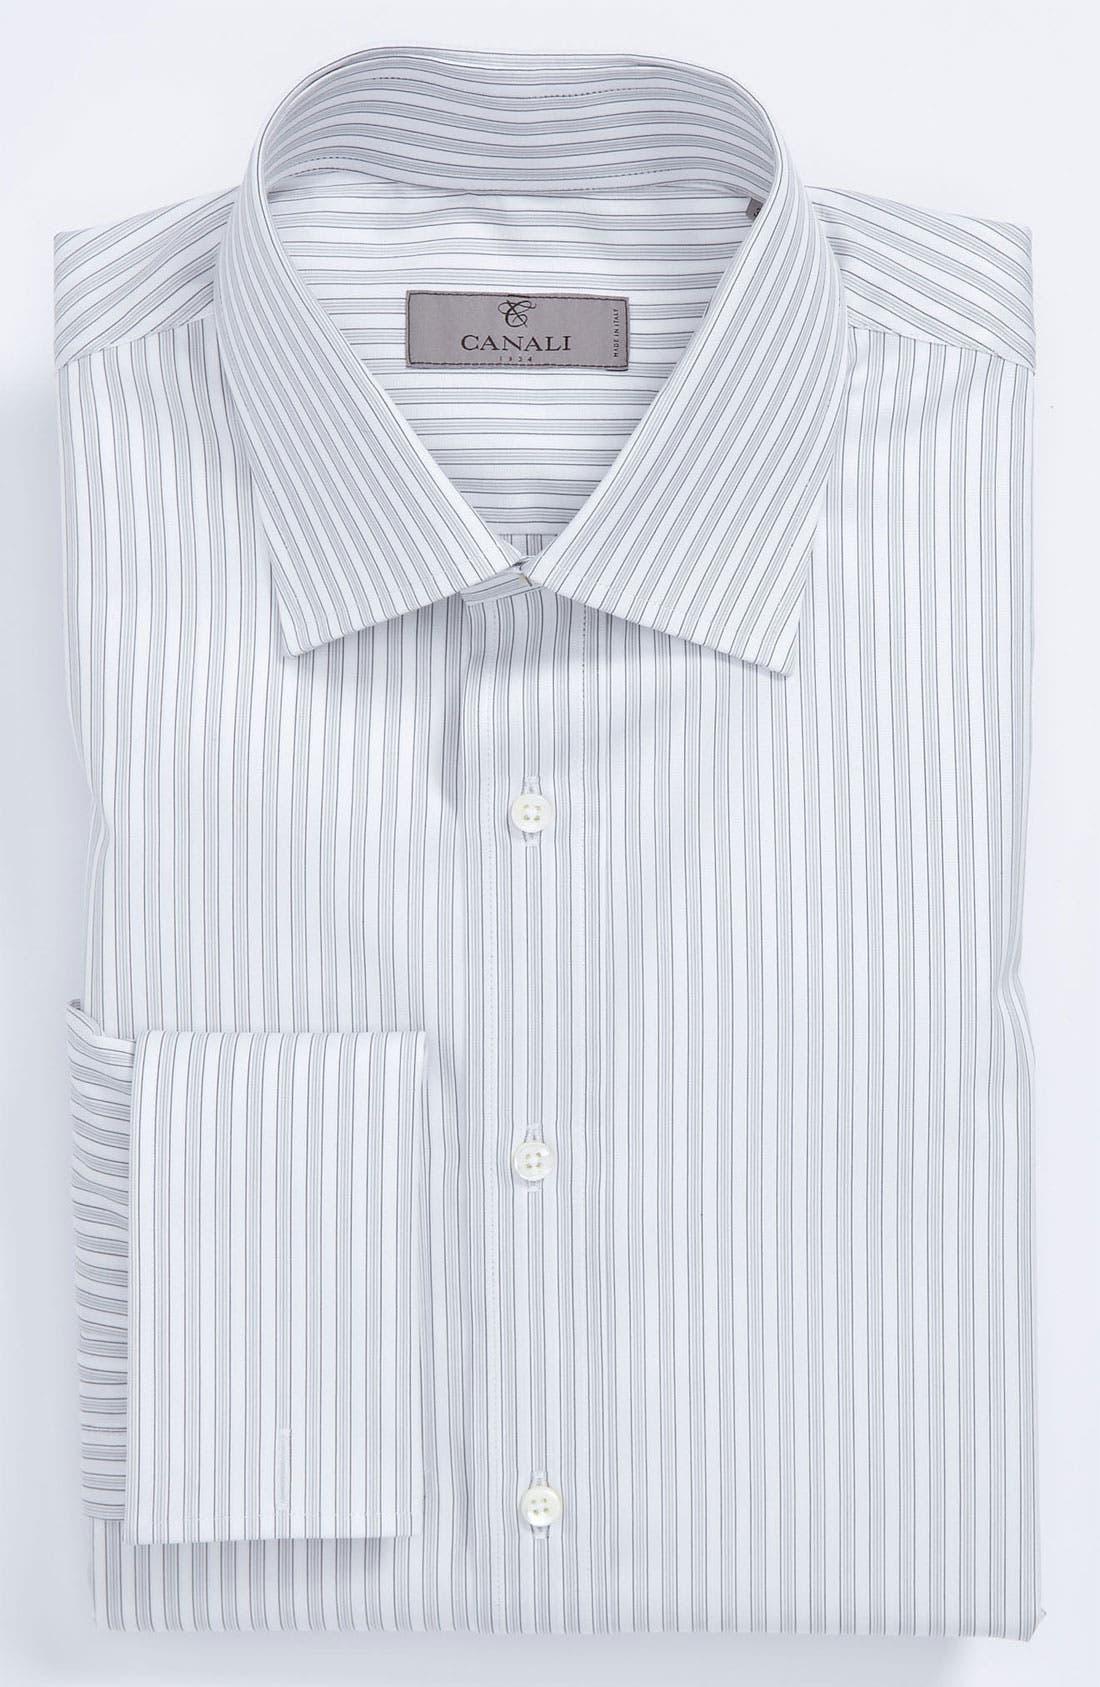 Main Image - Canali Regular Fit Dress Shirt